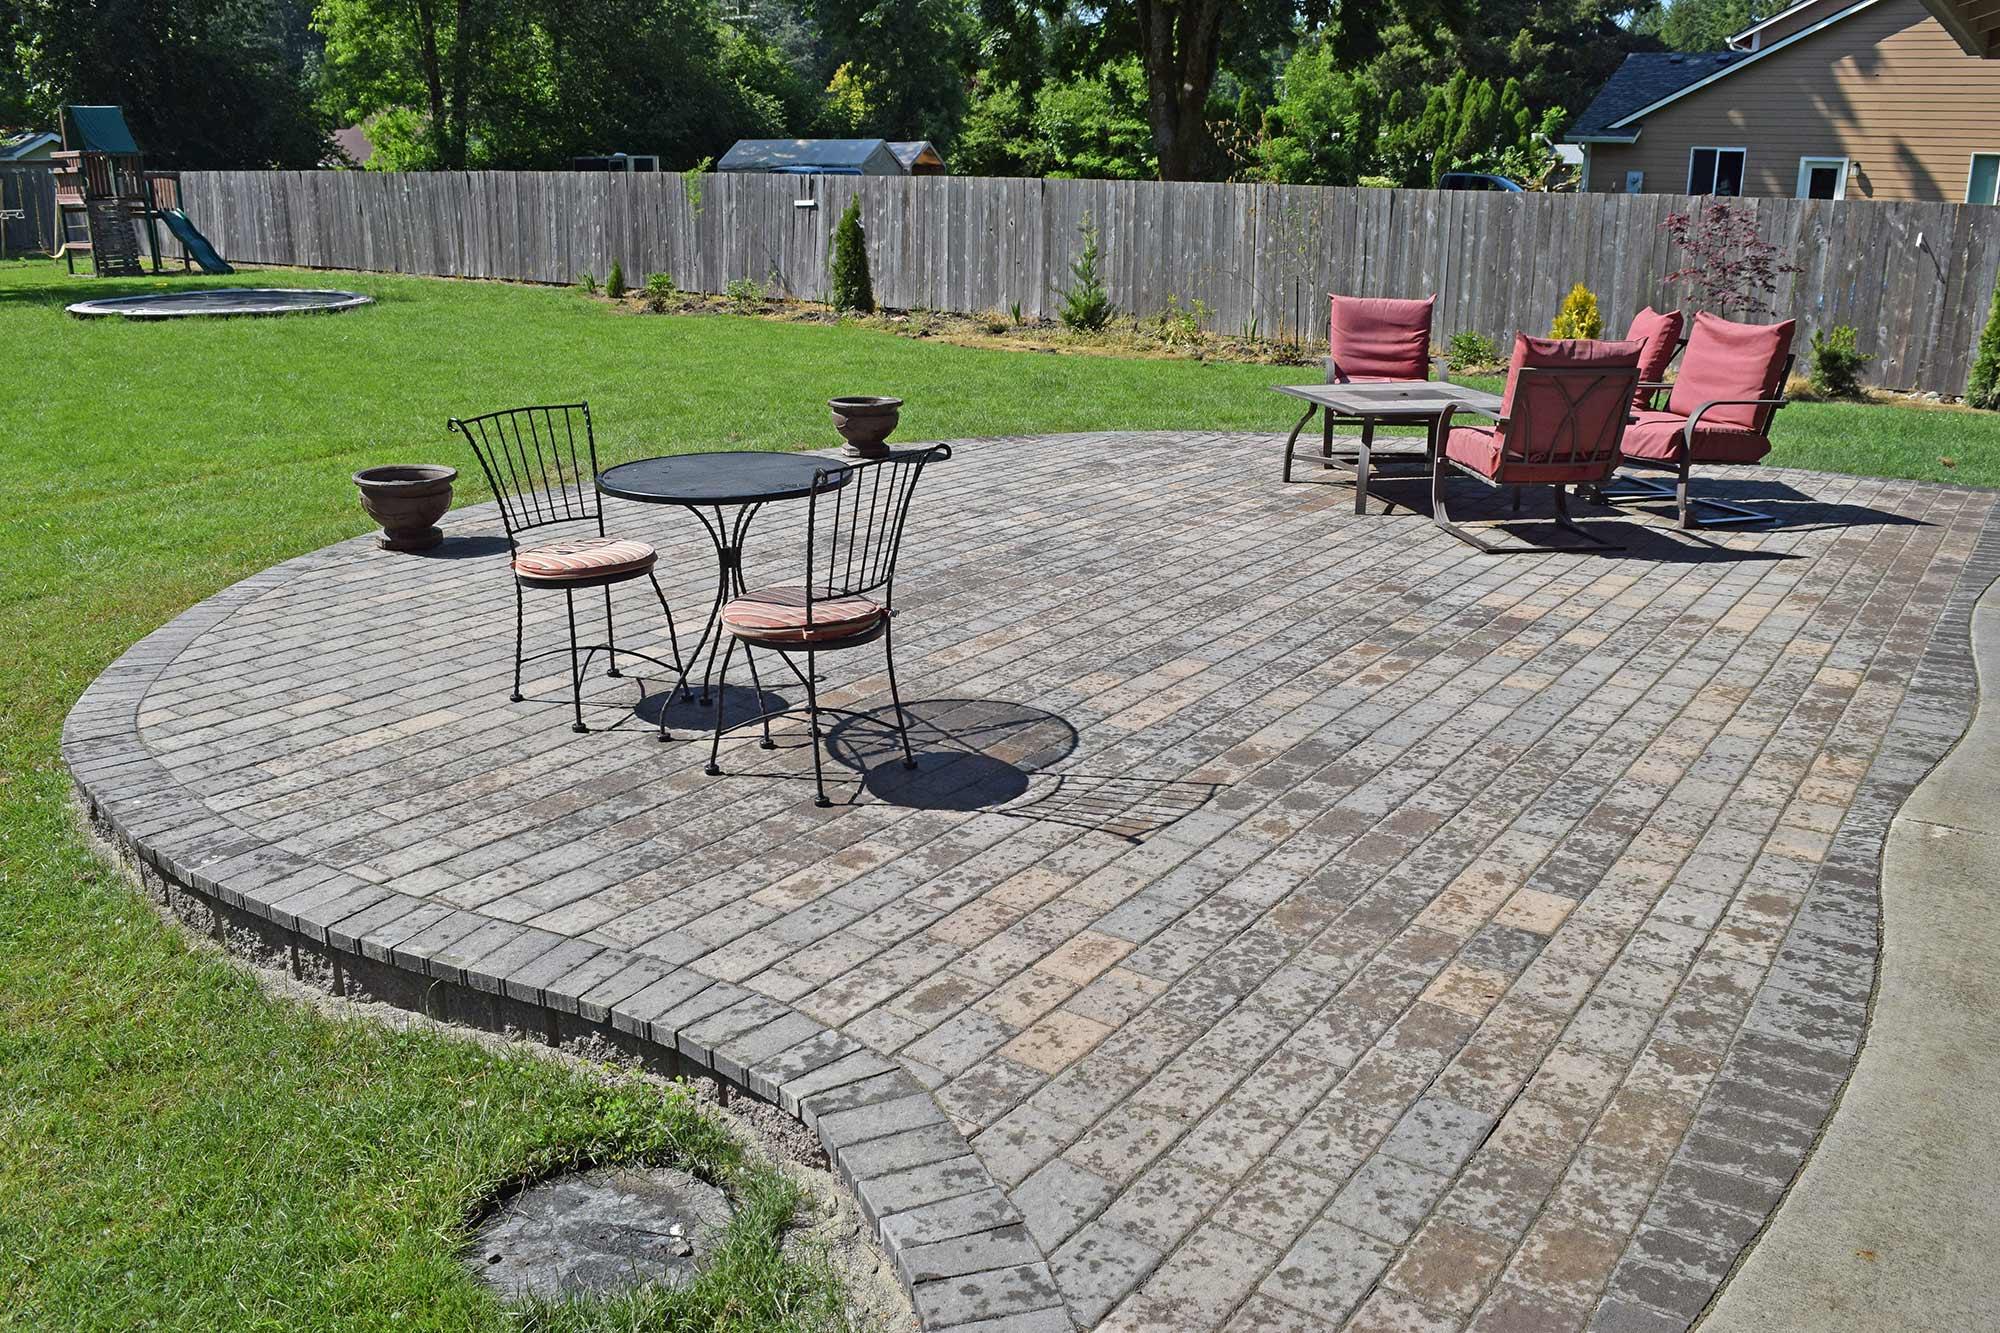 East Olympia Raised Patio - AJB Landscaping & Fence on Unlevel Backyard Ideas id=82554